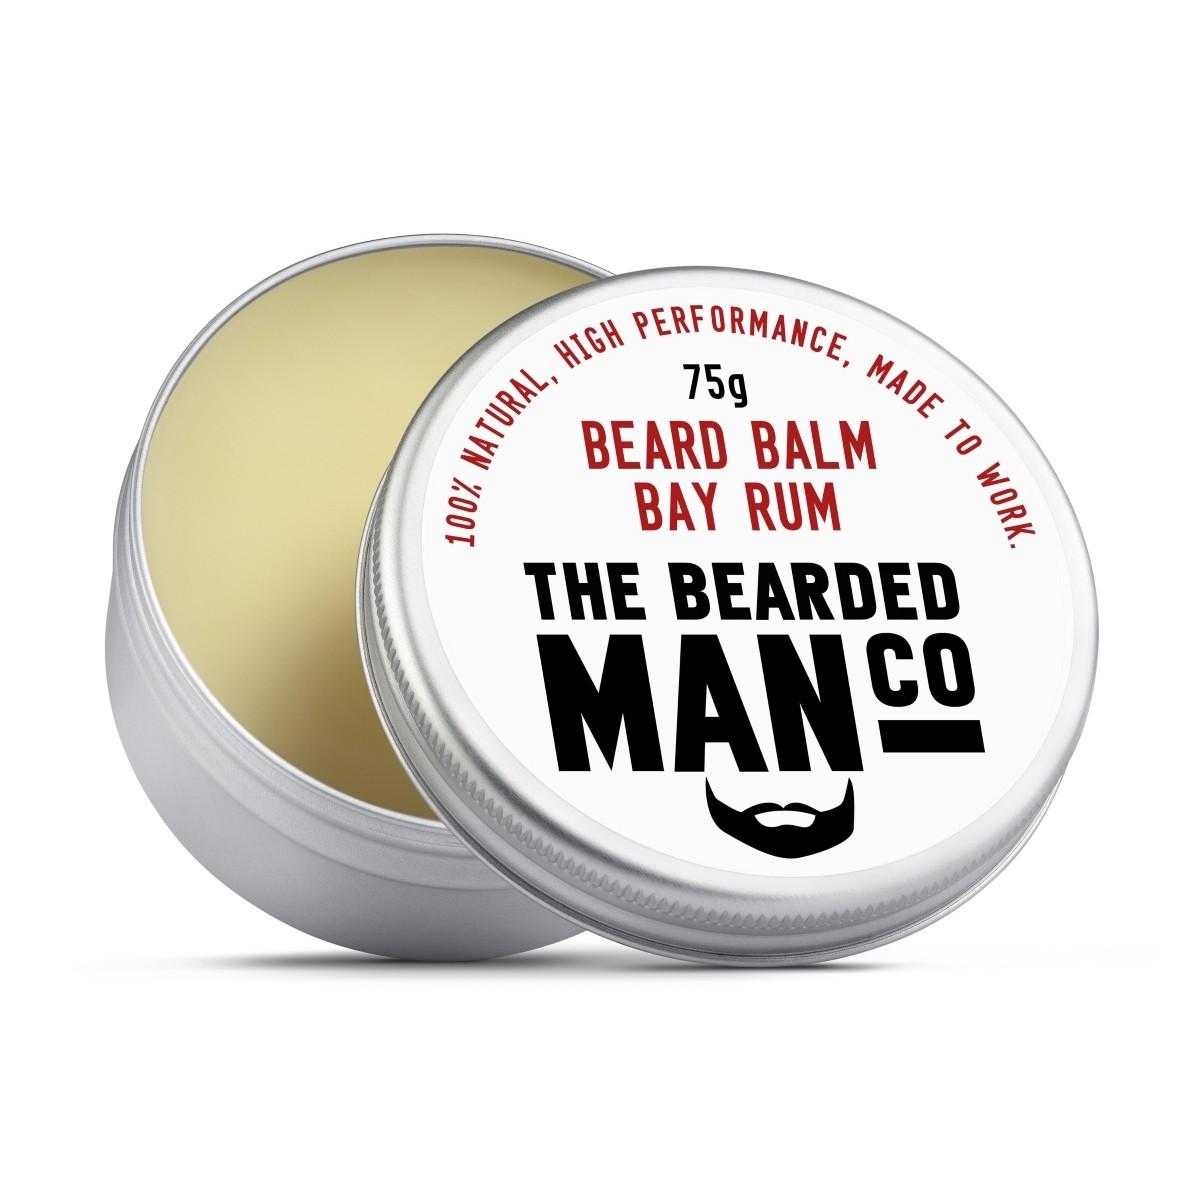 The Bearded Man Company Beard Balm Bay Rum